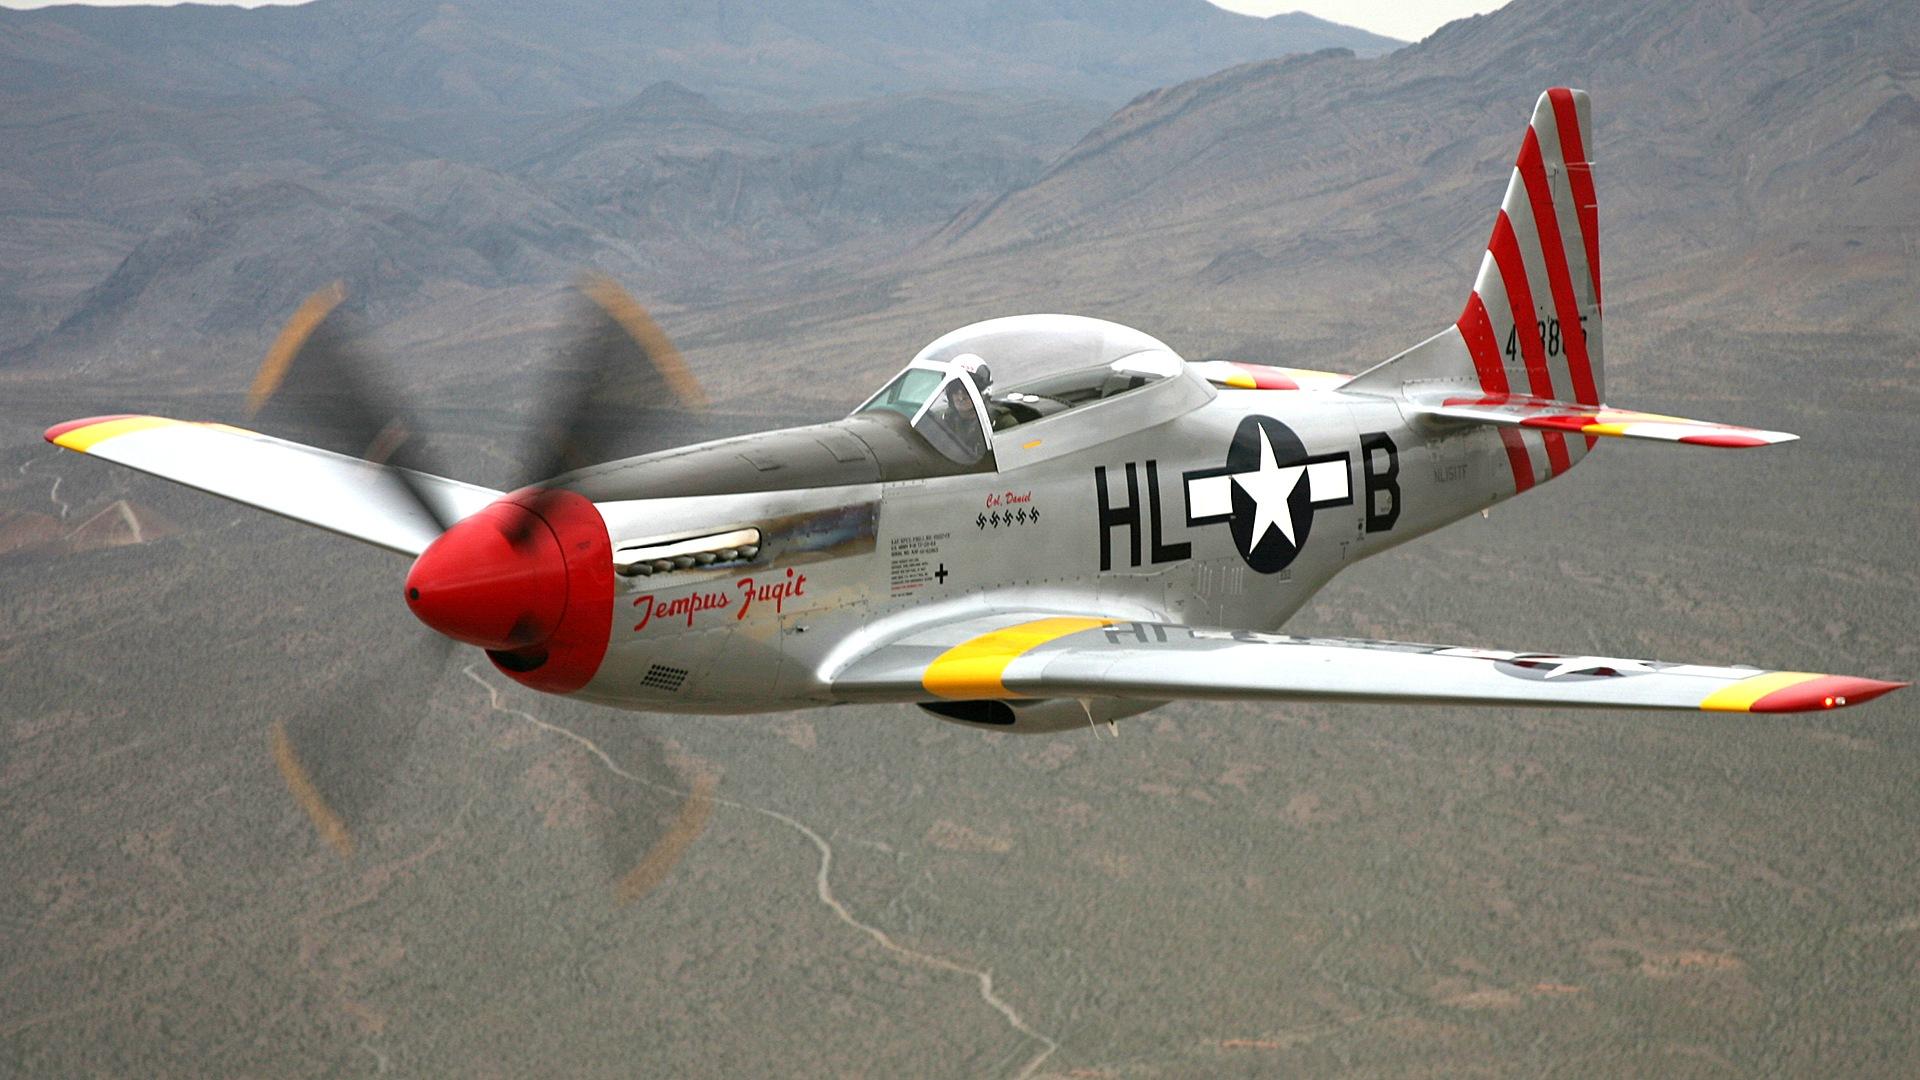 American Propeller Fighter Wallpaper 1920x1080